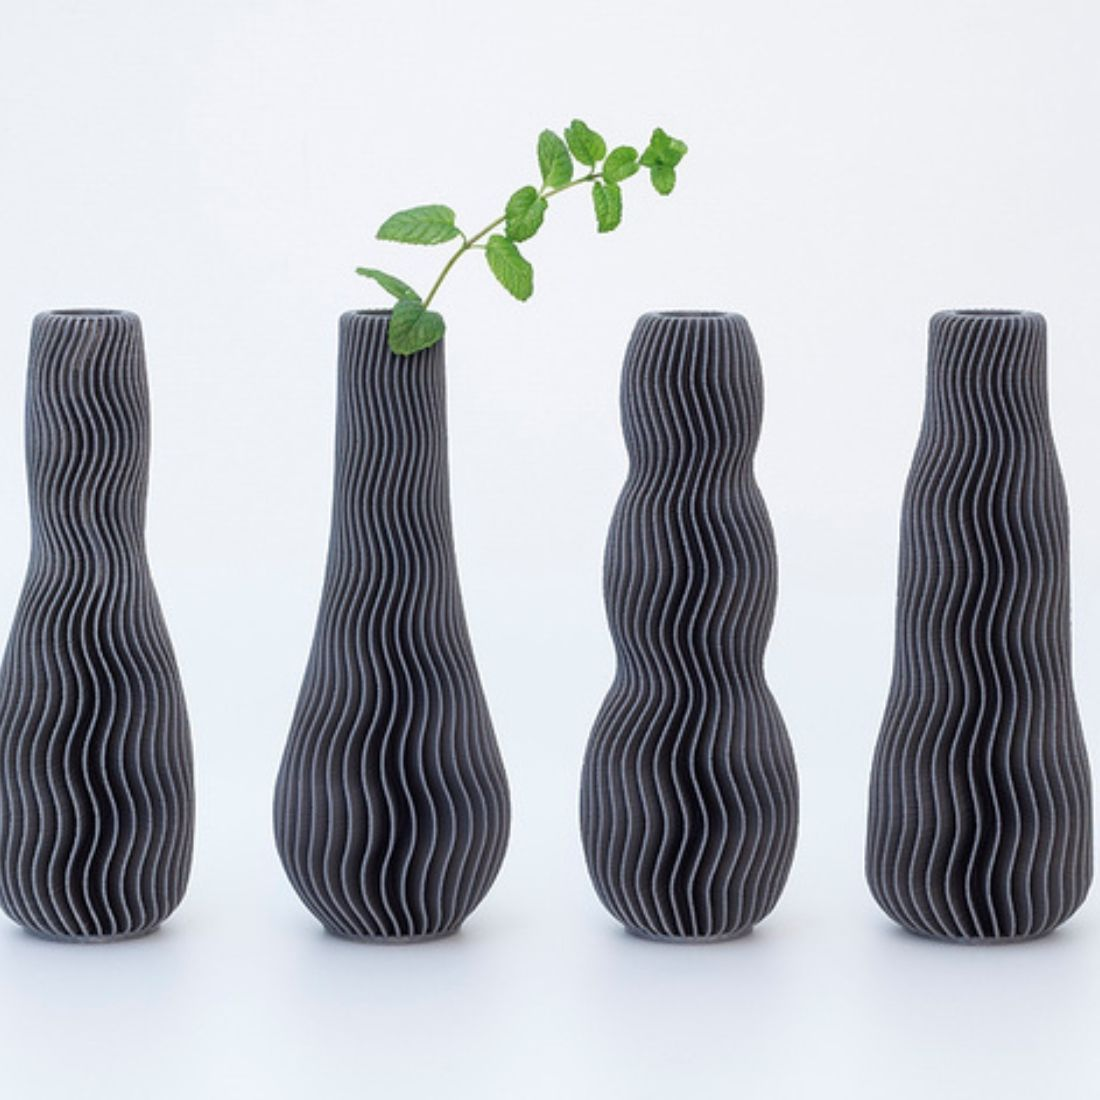 3d printed vase 3d printed portfolio pinterest 3d 3d 3d printed vase reviewsmspy